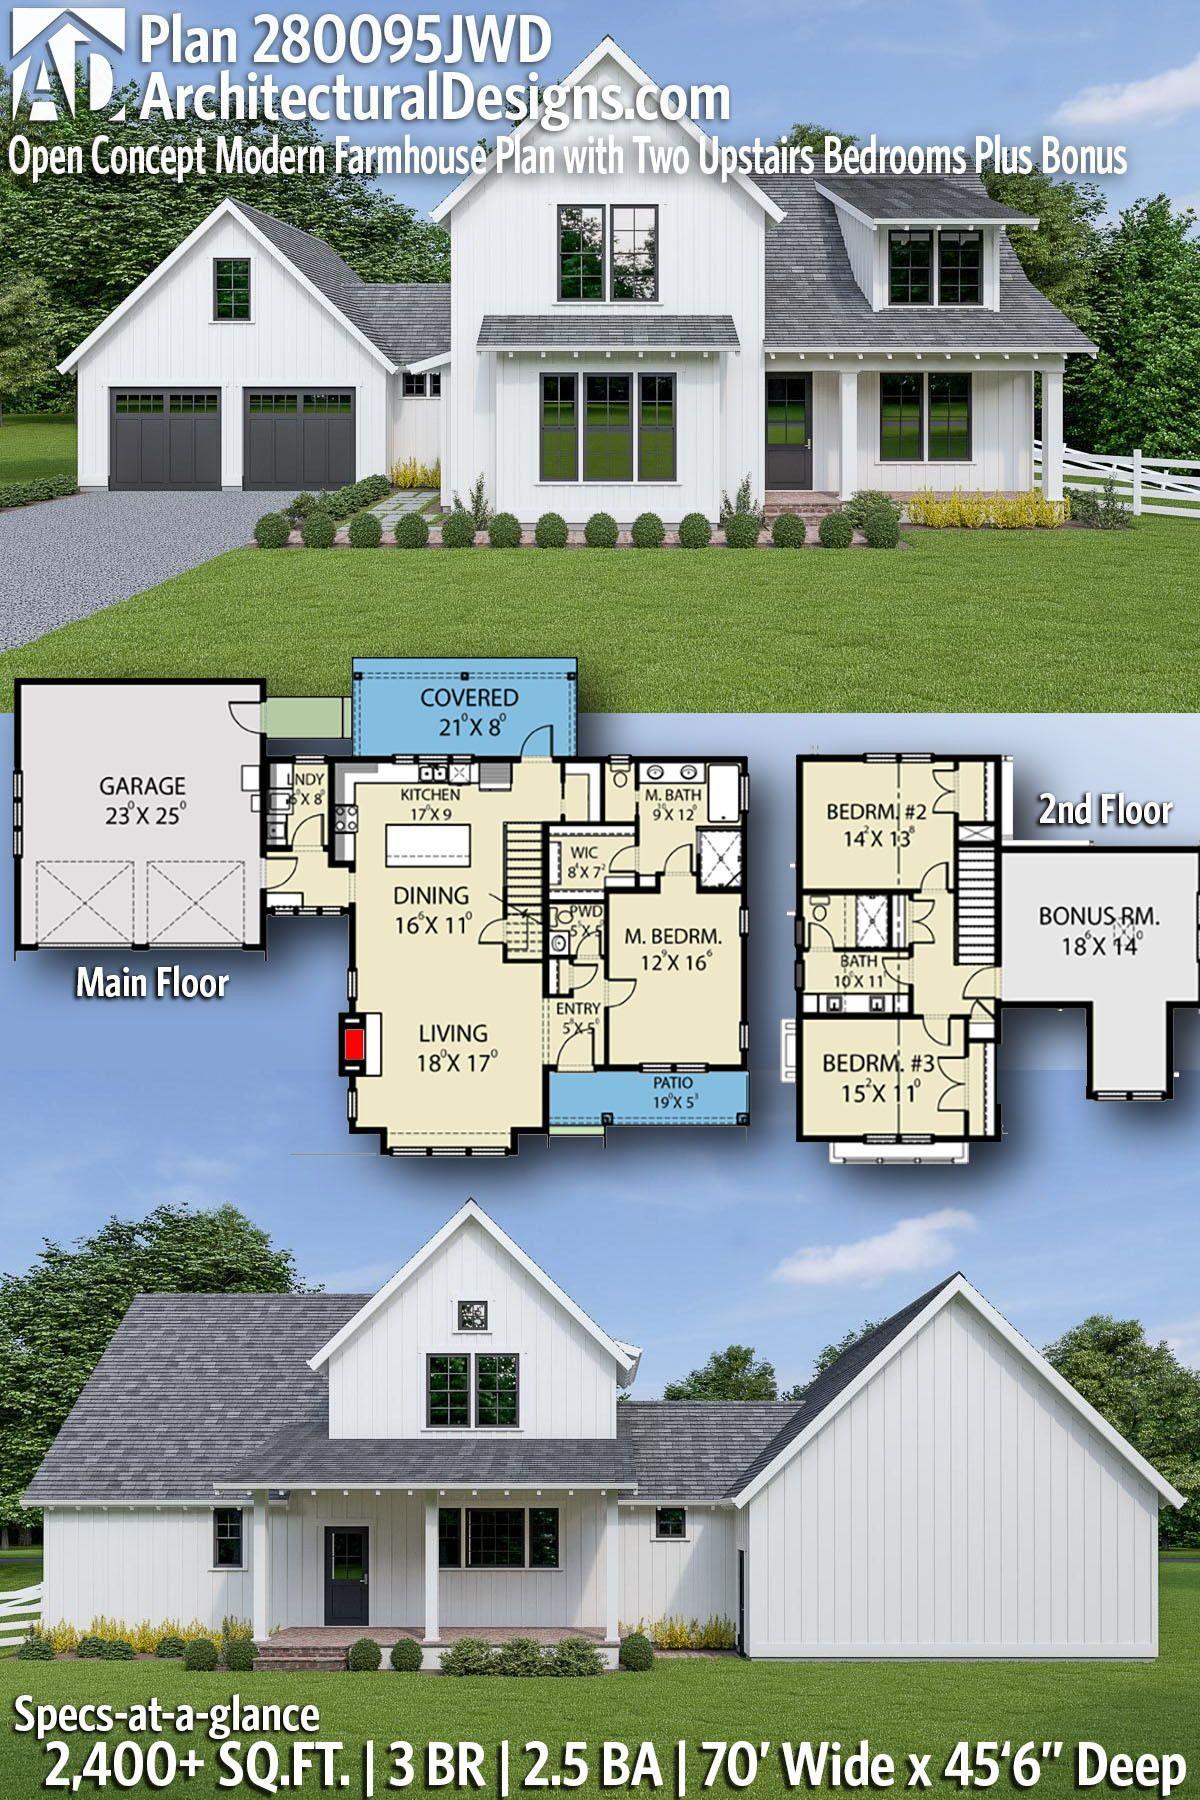 Plan 280095jwd Open Concept Modern Farmhouse Plan With Two Upstairs Bedrooms Plus Bonus Farmhouse Plans Modern Farmhouse Plans House Plans Farmhouse